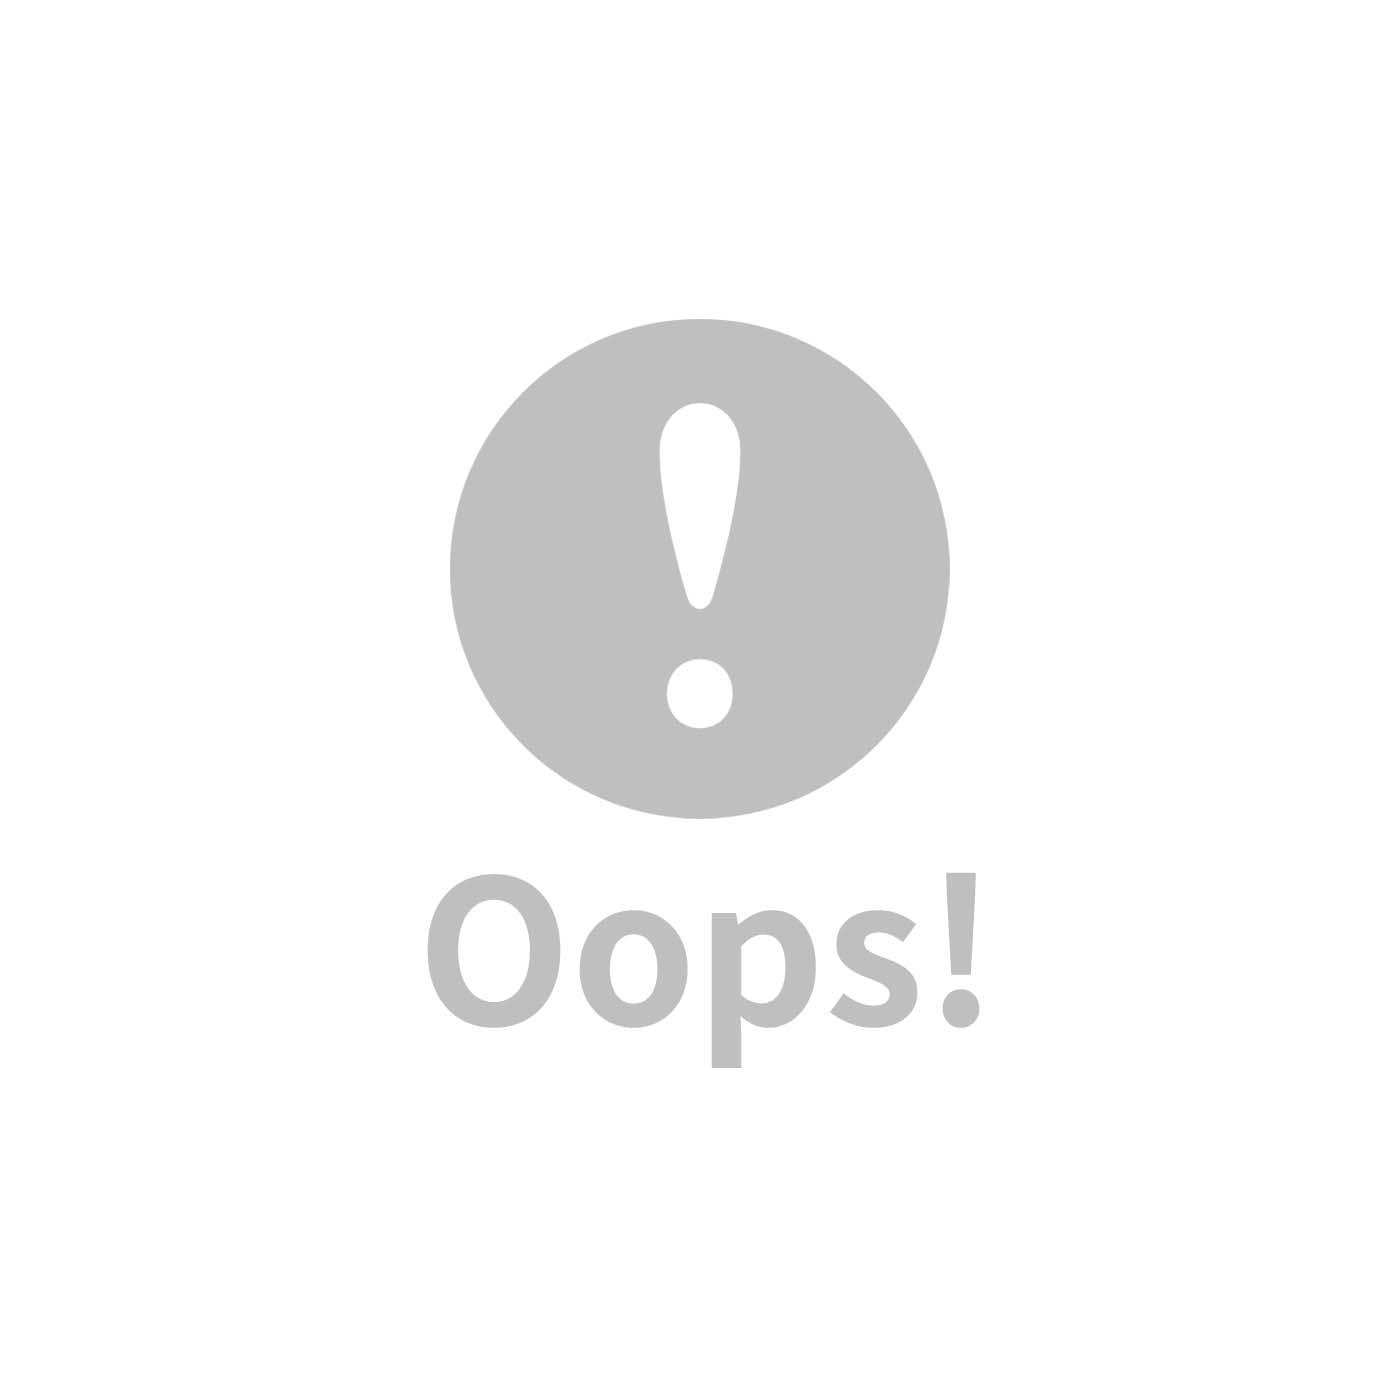 global affairs 童話手工編織安撫搖鈴_林地系列(小刺蝟)